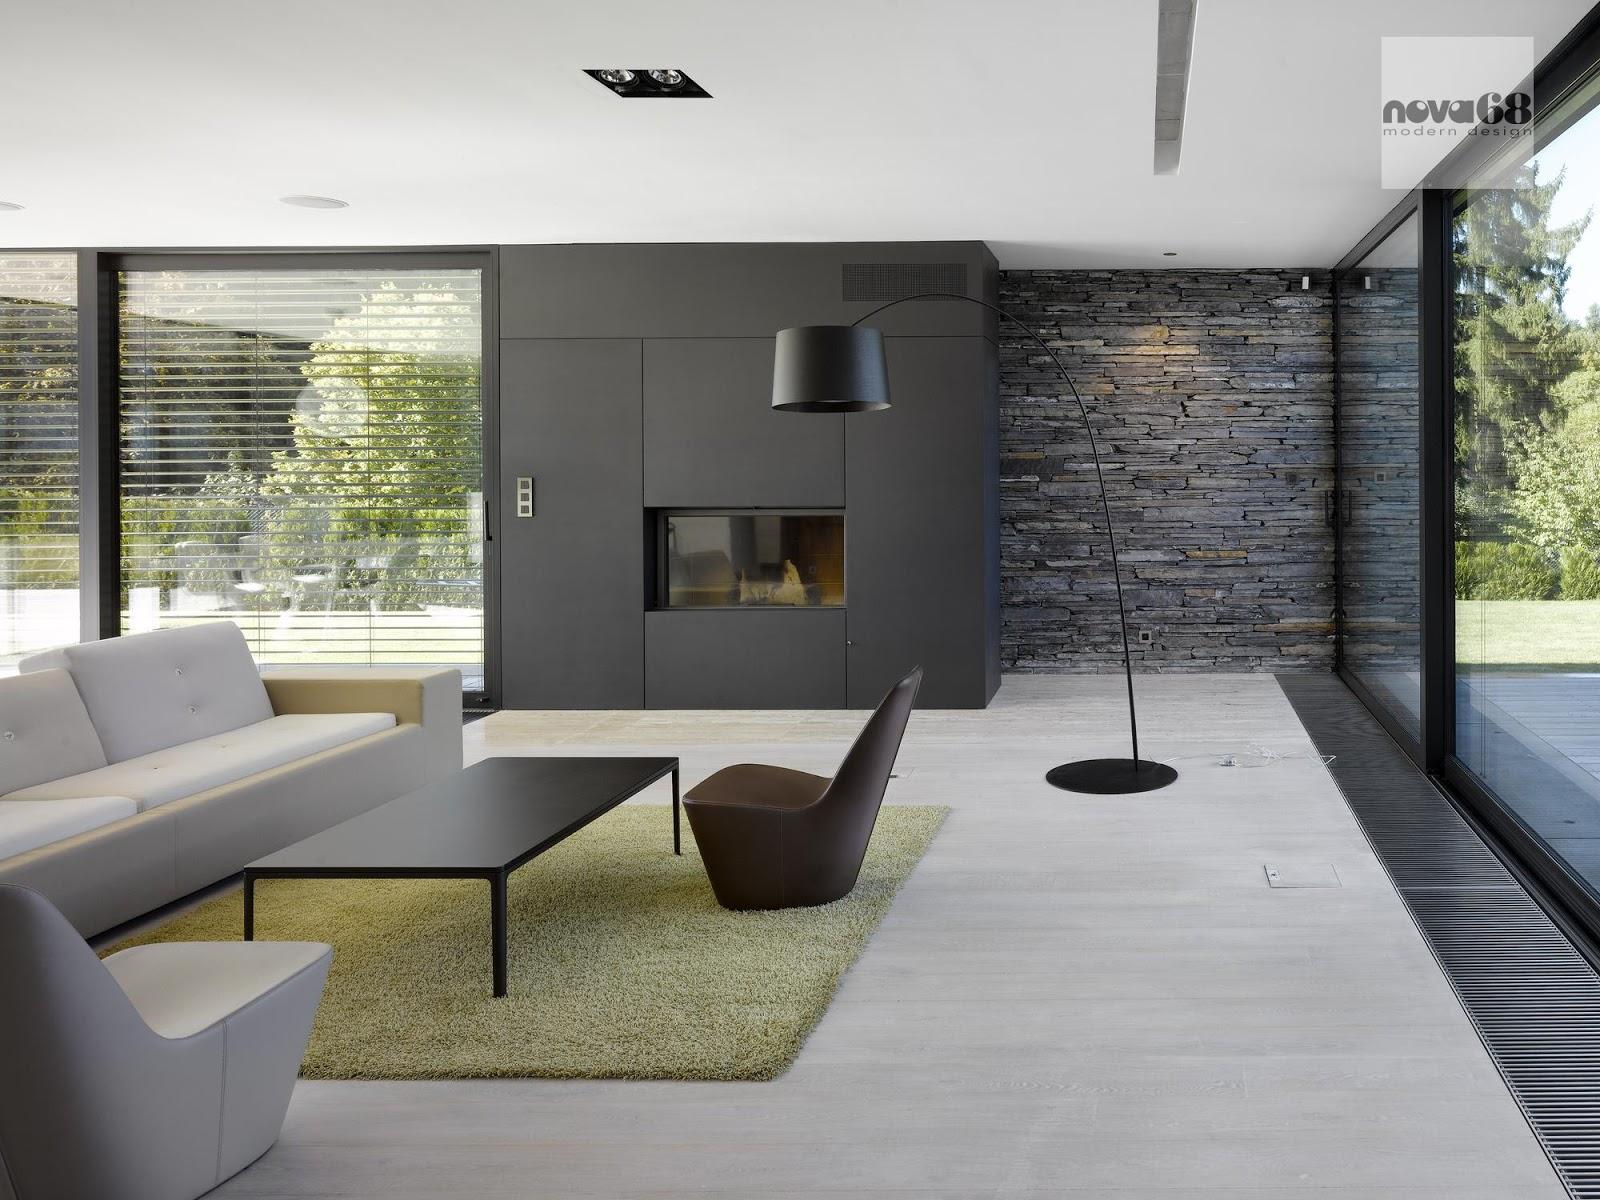 Foscarini Twiggy Floor Lamp | My Modern House